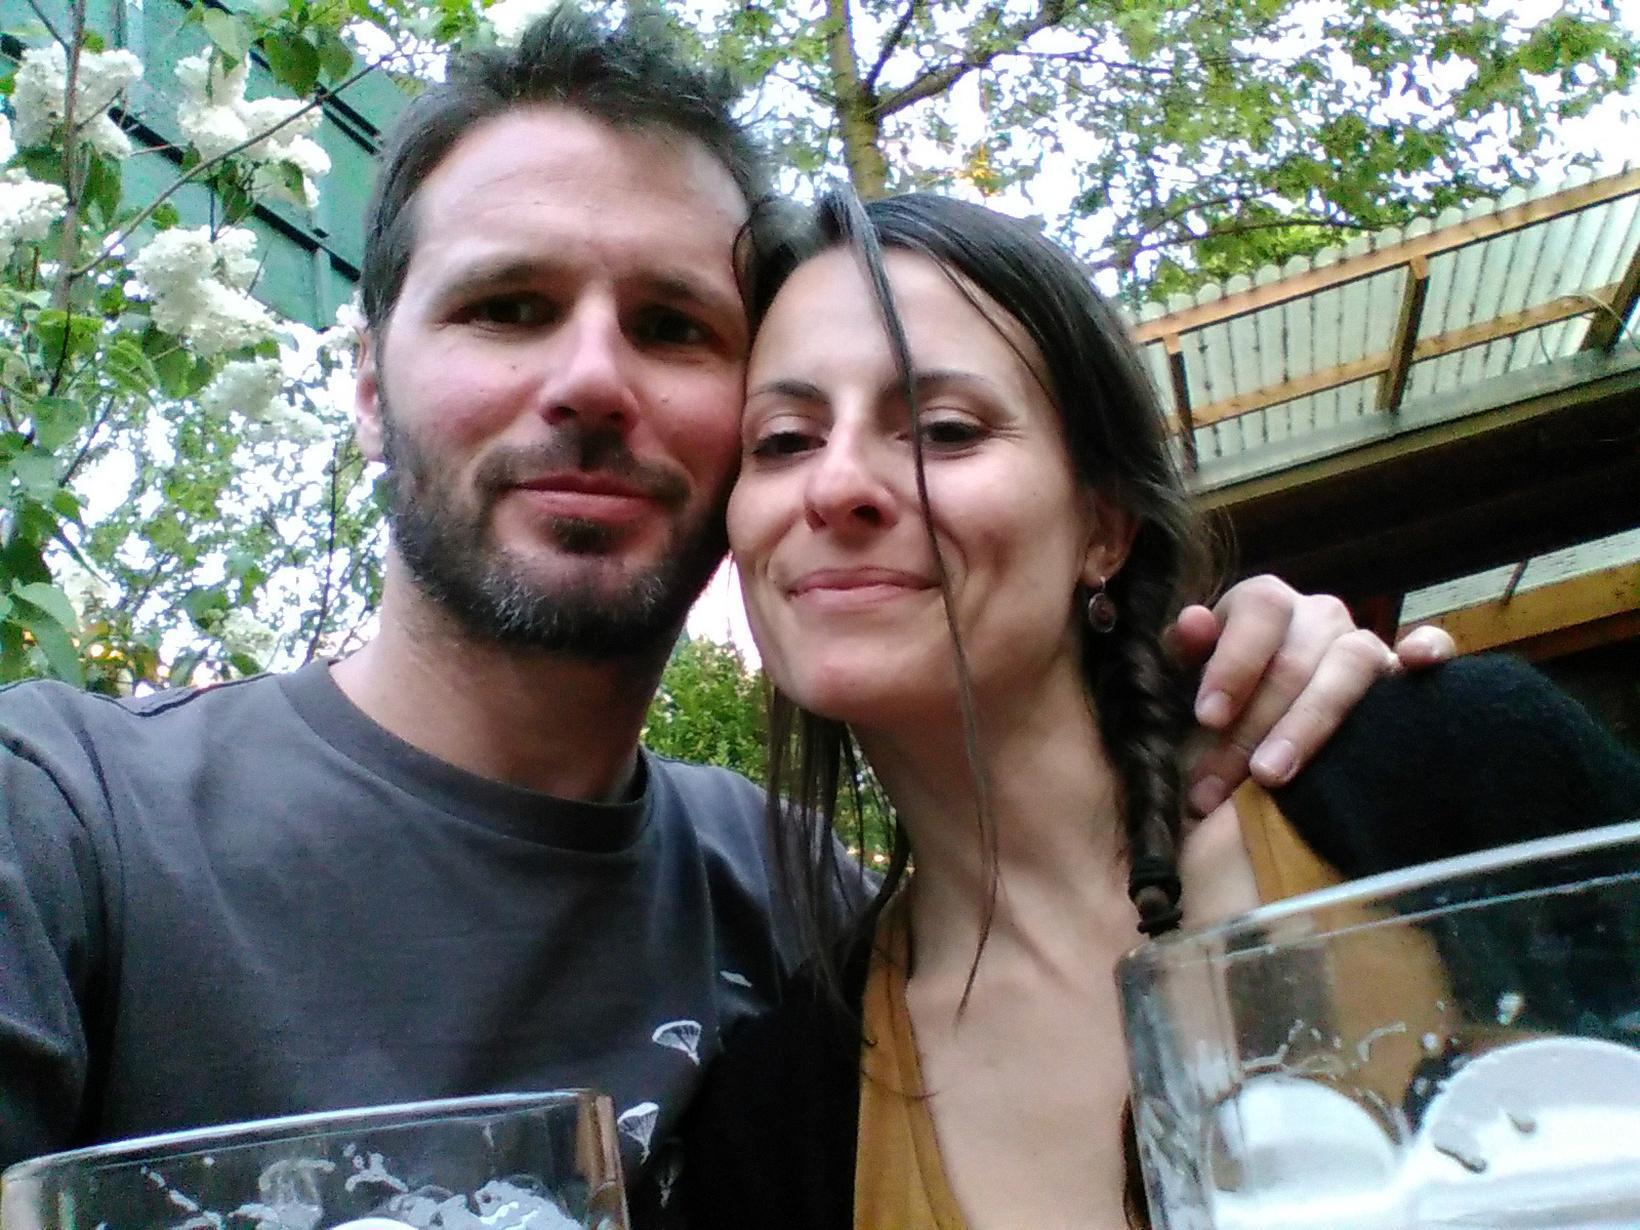 Alexandra & Ollivier from Aix-les-Bains, France